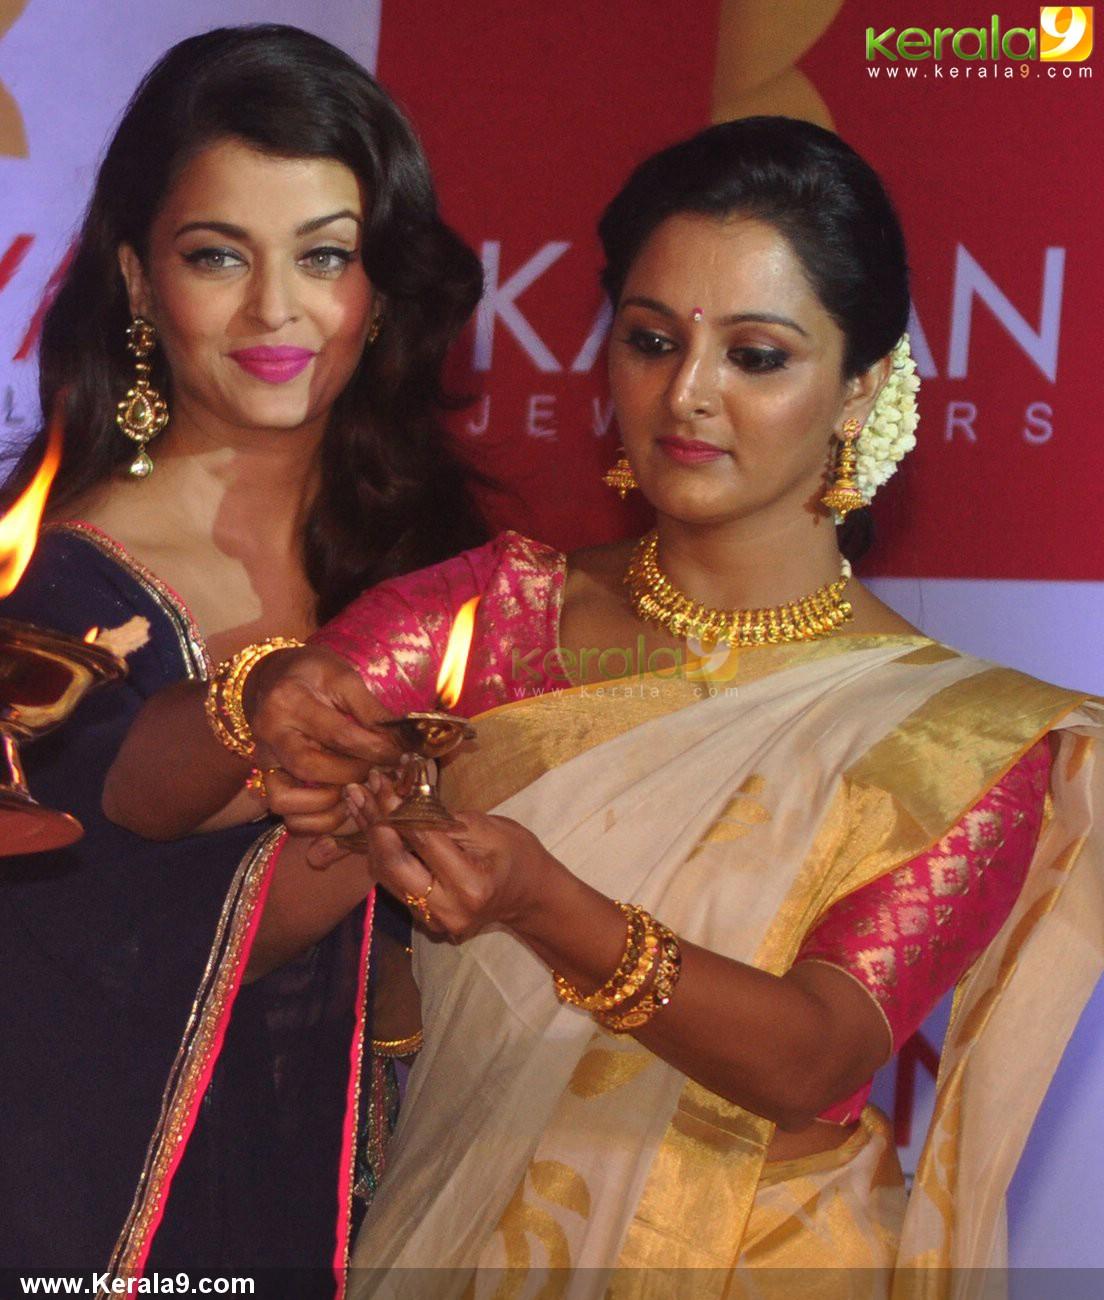 kalyan jewellers five stores inauguration photos - aishwarya rai